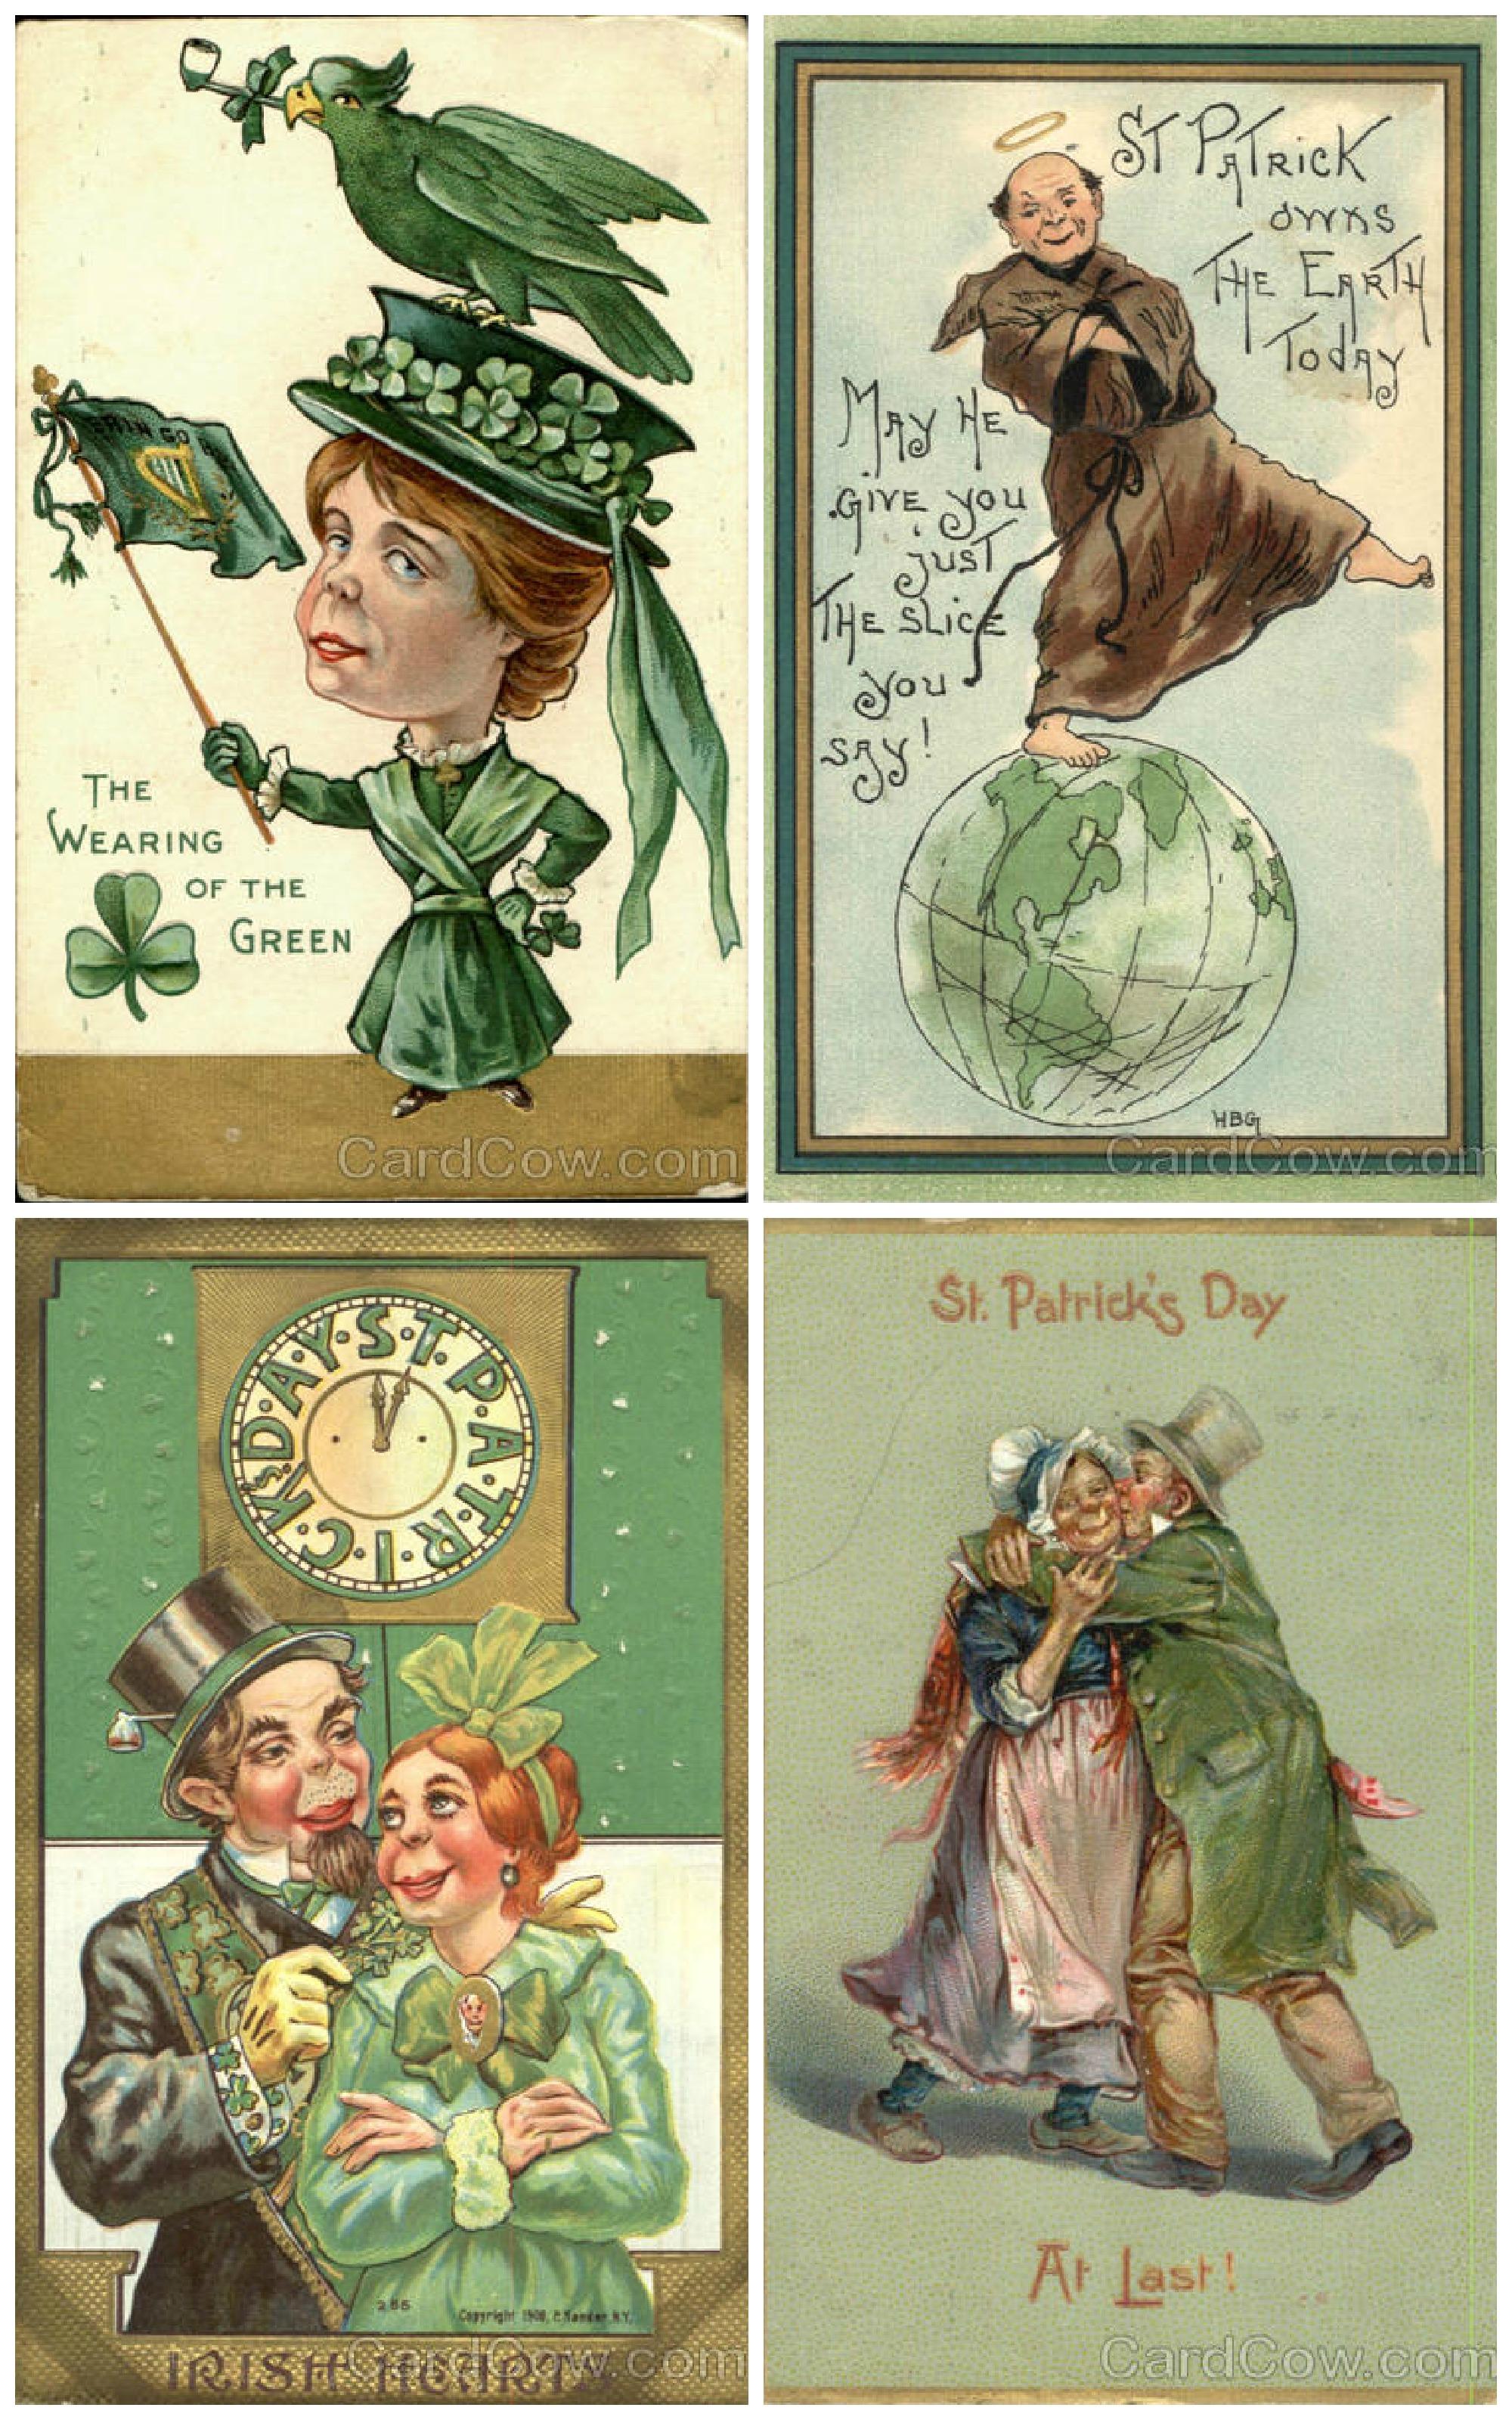 St Patricks Day Vintage Cards Menopausel Supermodel